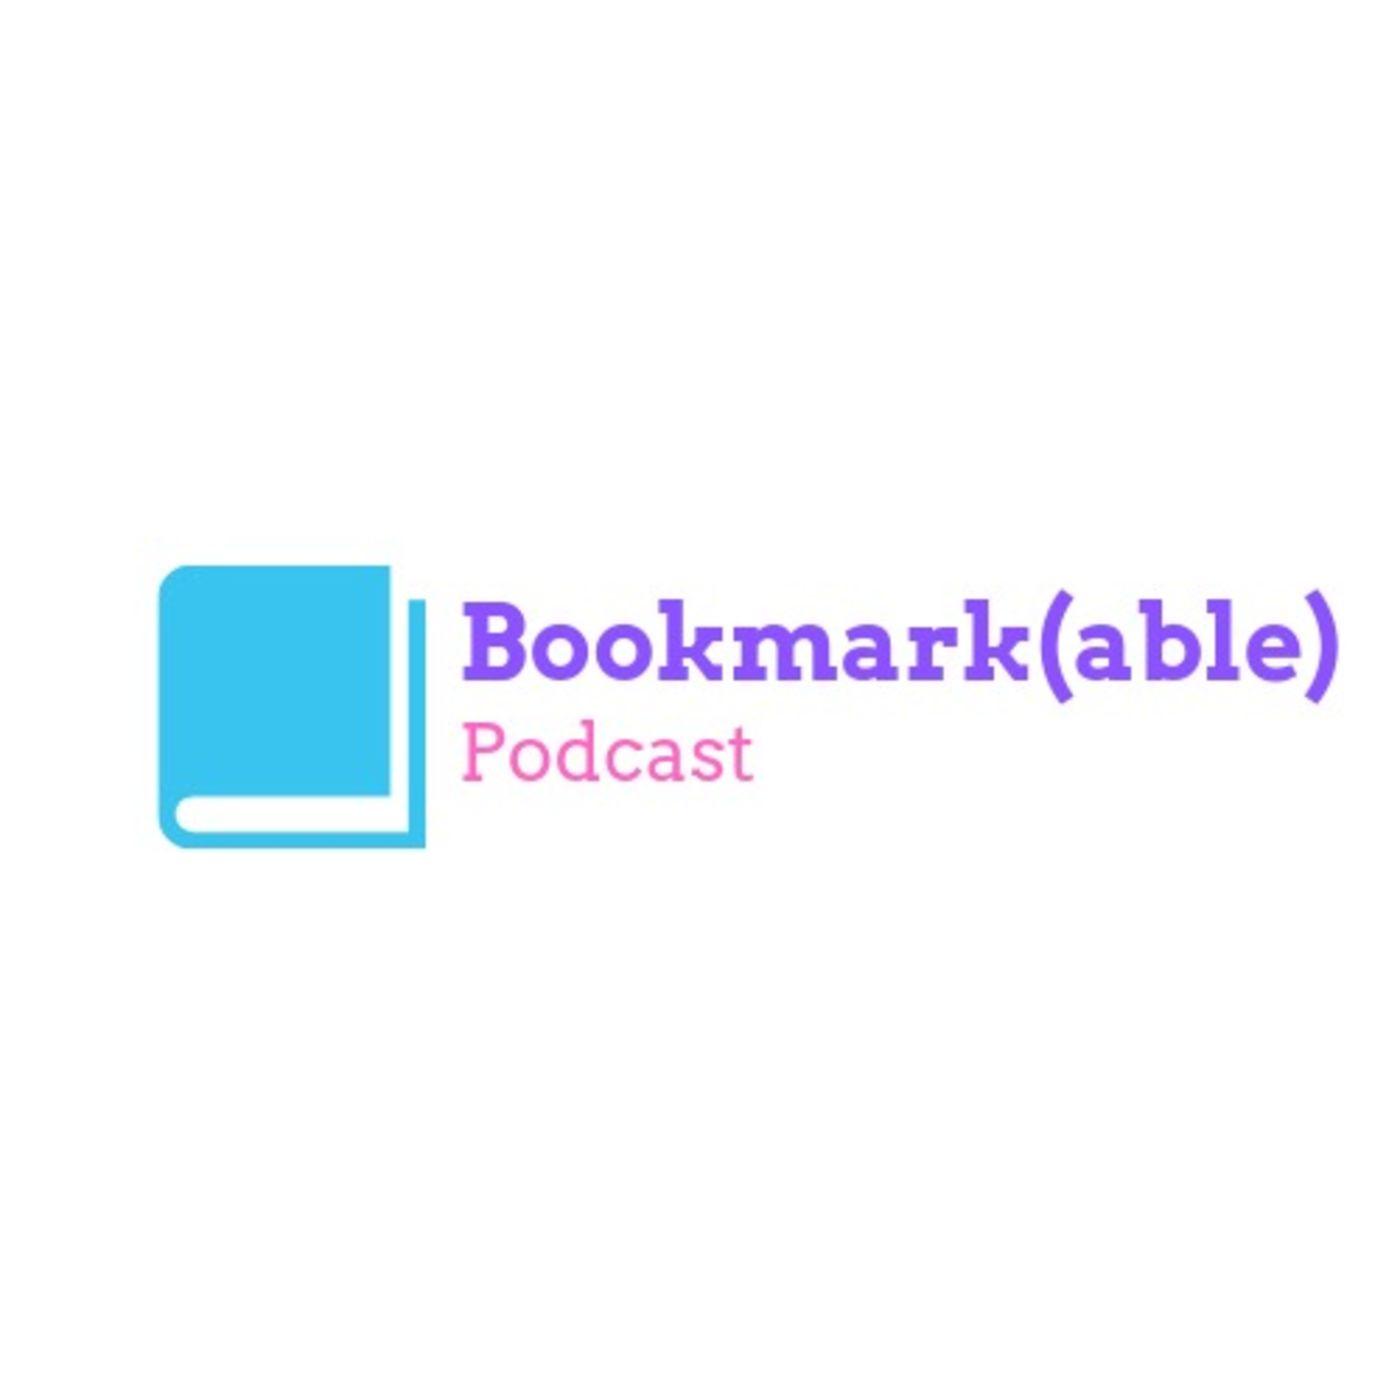 Chapter 7: Bookish Social Media